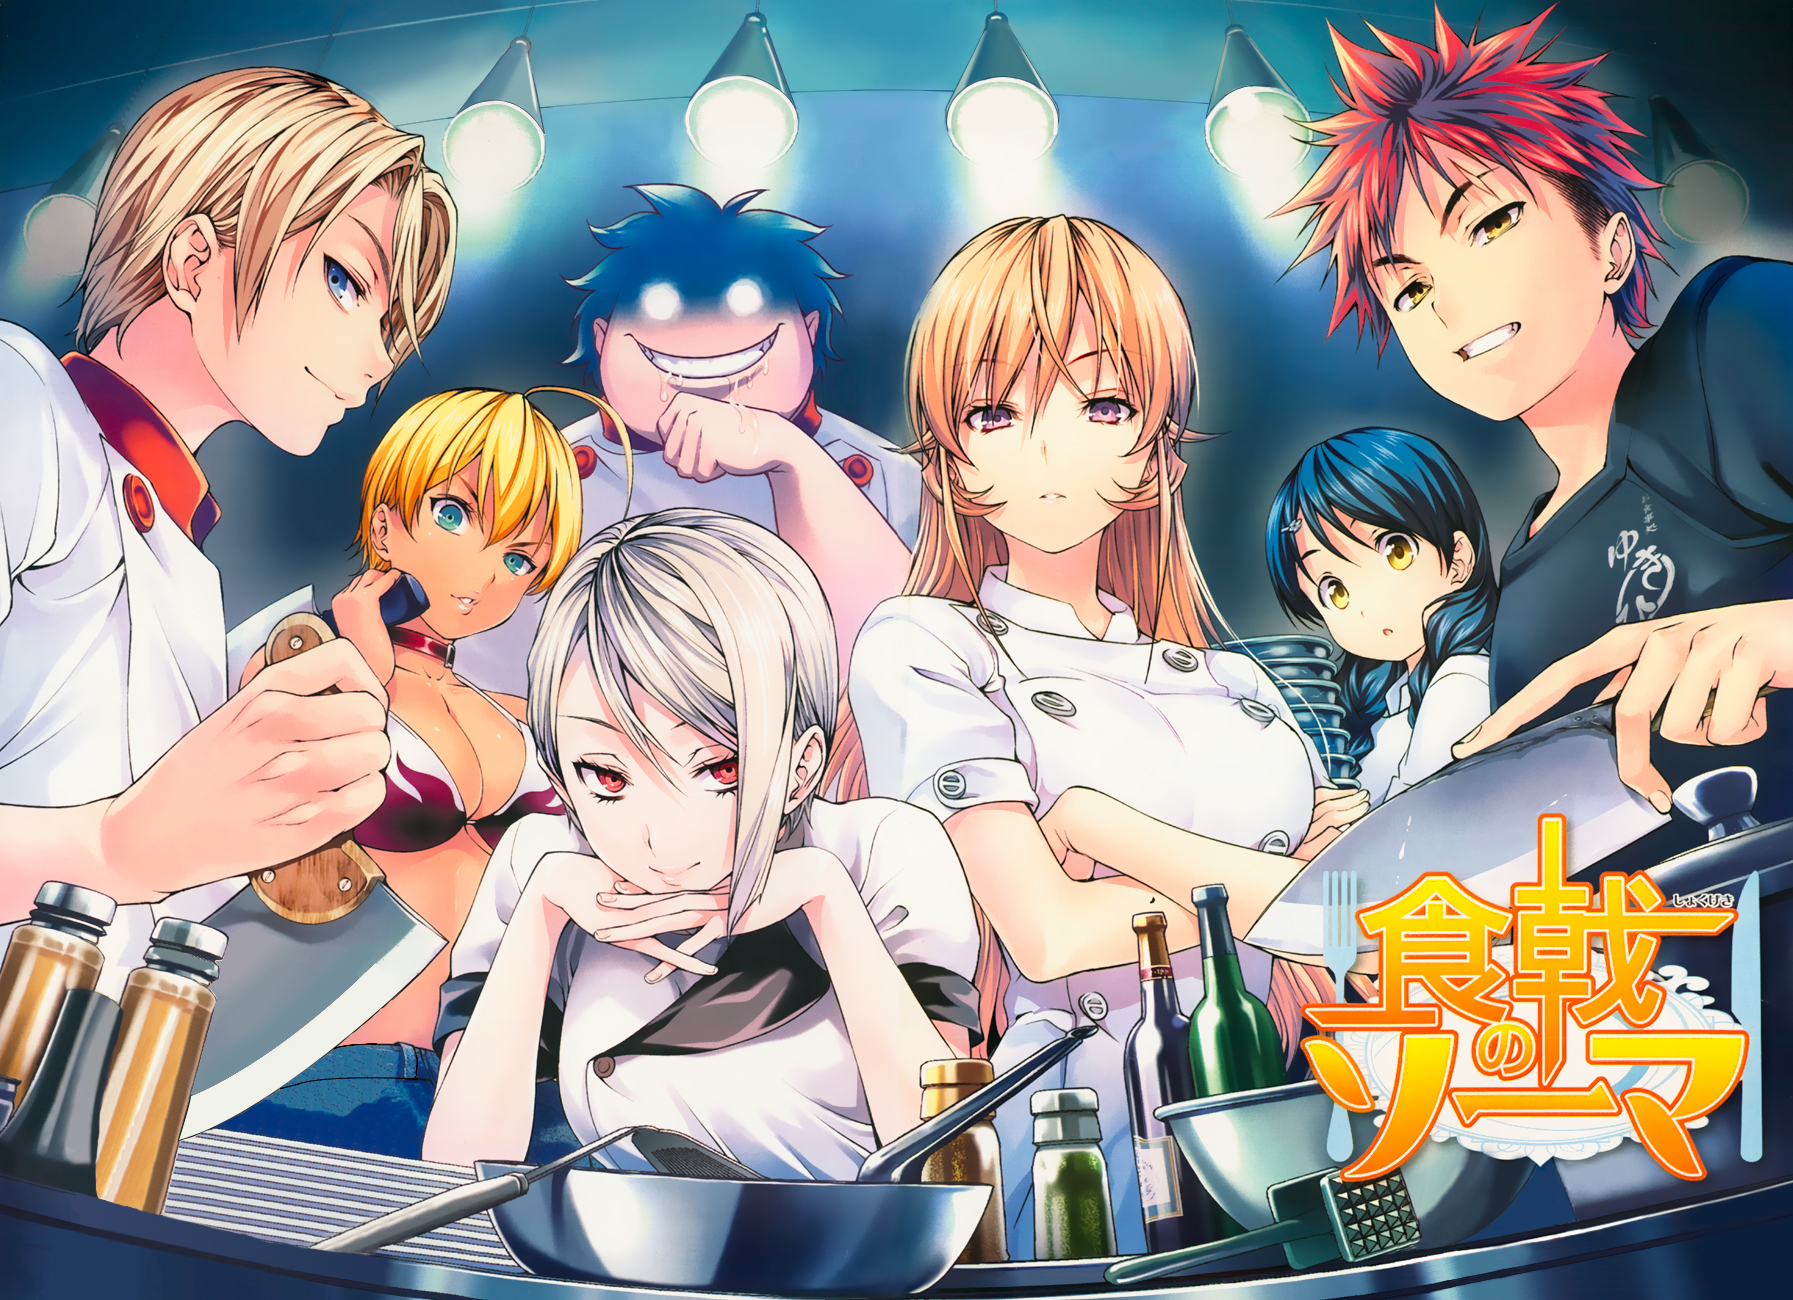 Kết quả hình ảnh cho Shokugeki no Souma Food Wars anime